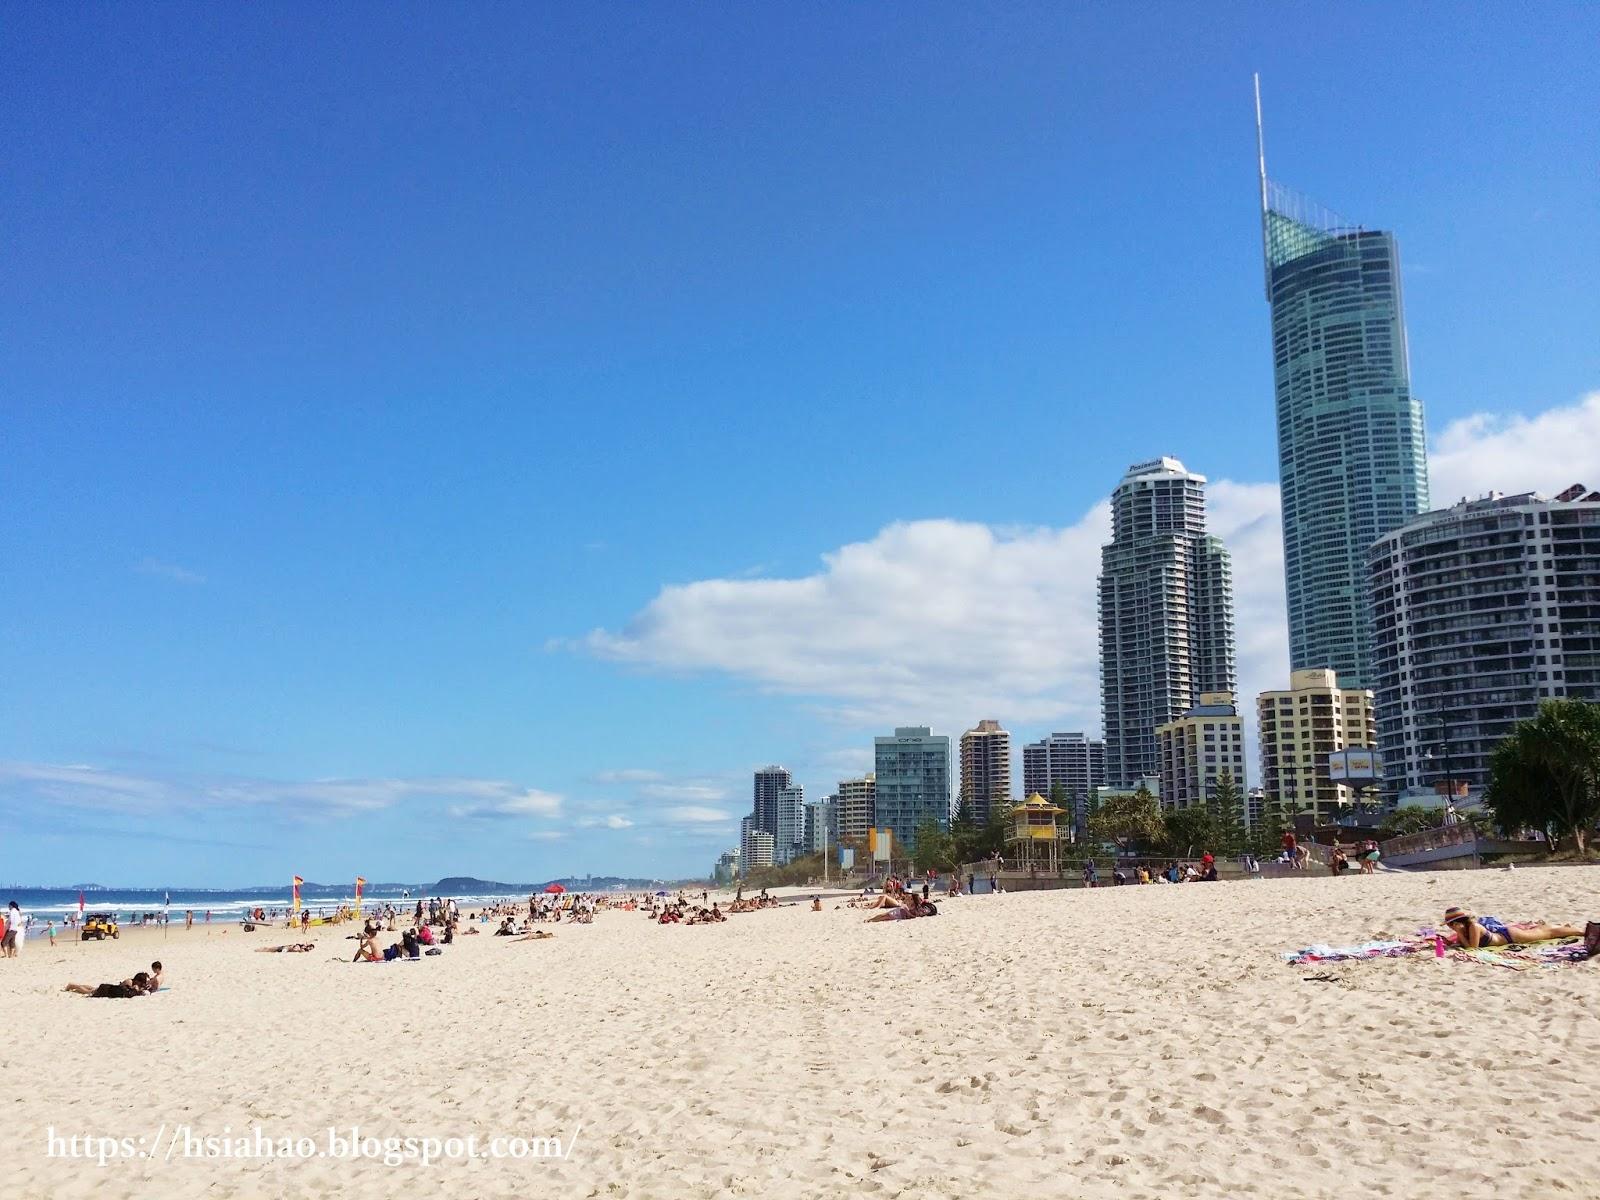 黃金海岸-衝浪者天堂-Gold-Coast-Surfers-Paradise